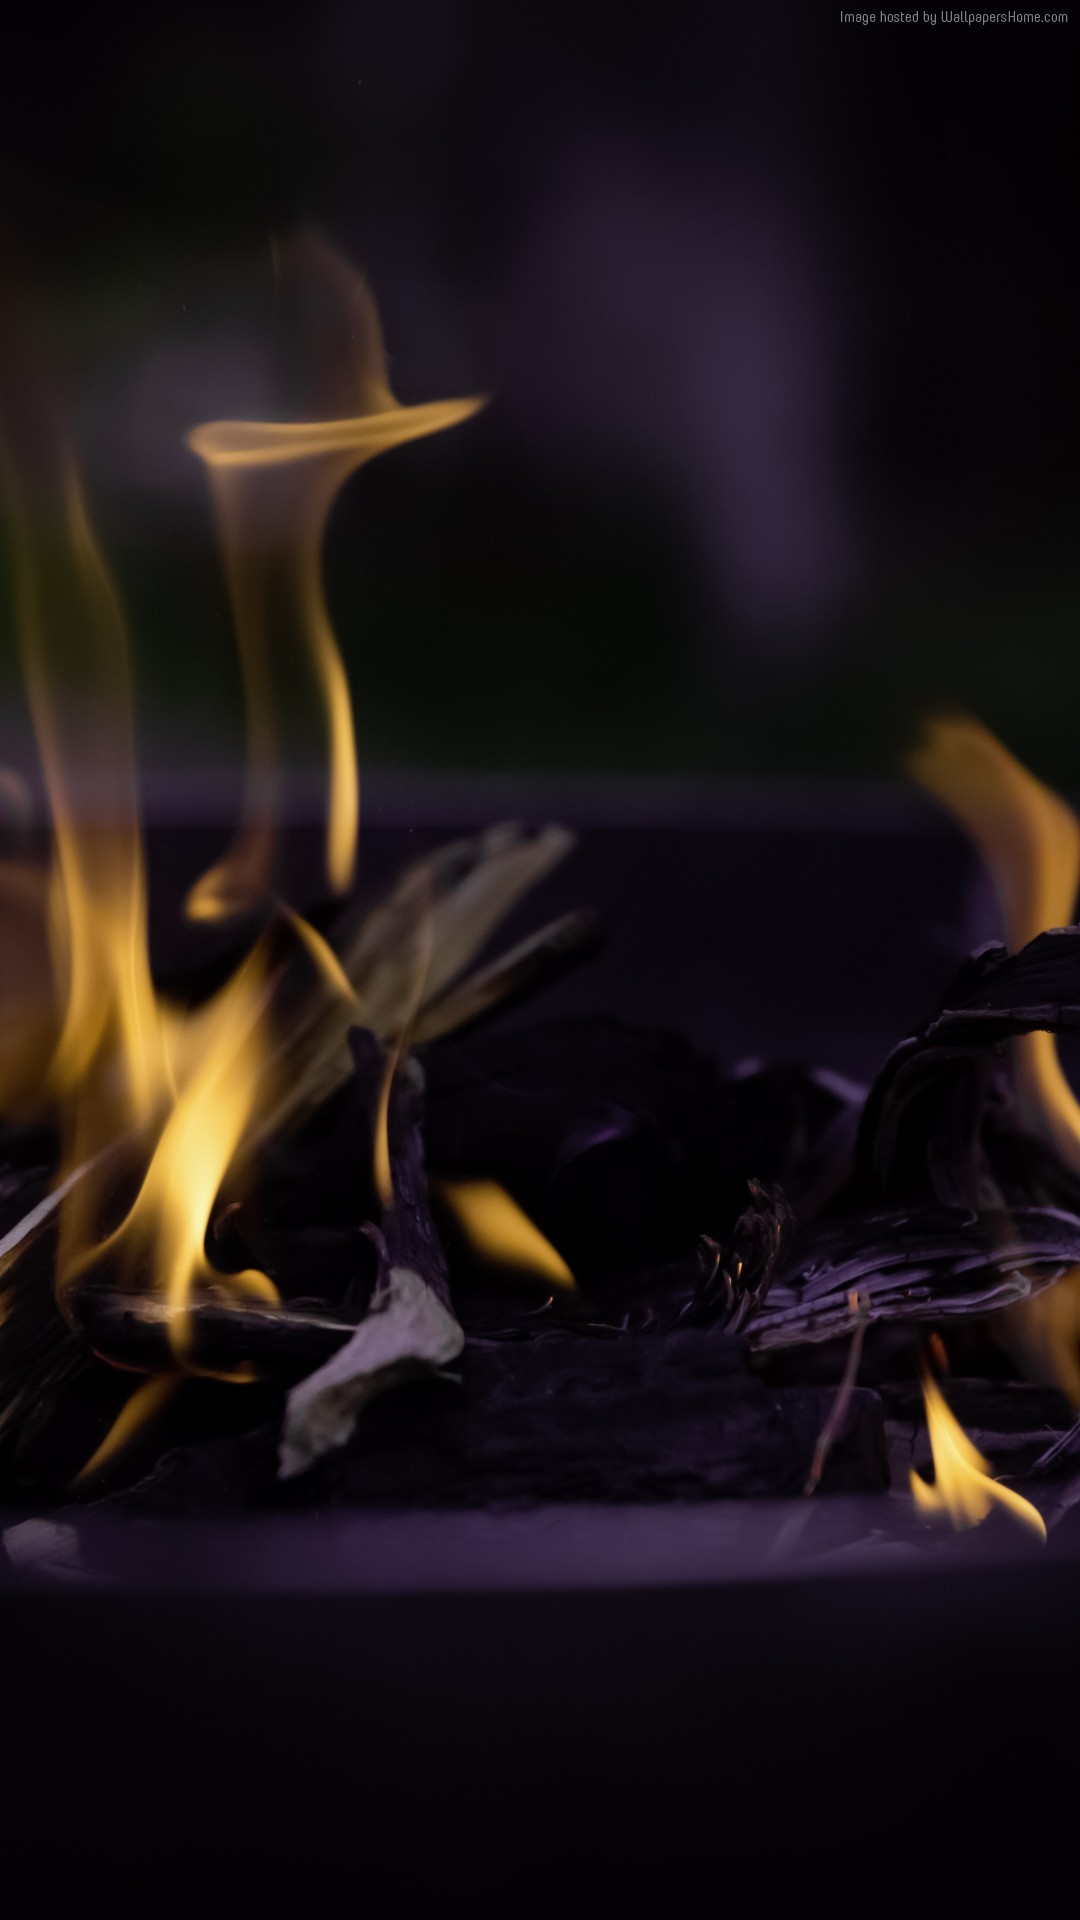 … ogon wallpaper iPhone 7 fire flame macro bonfire …